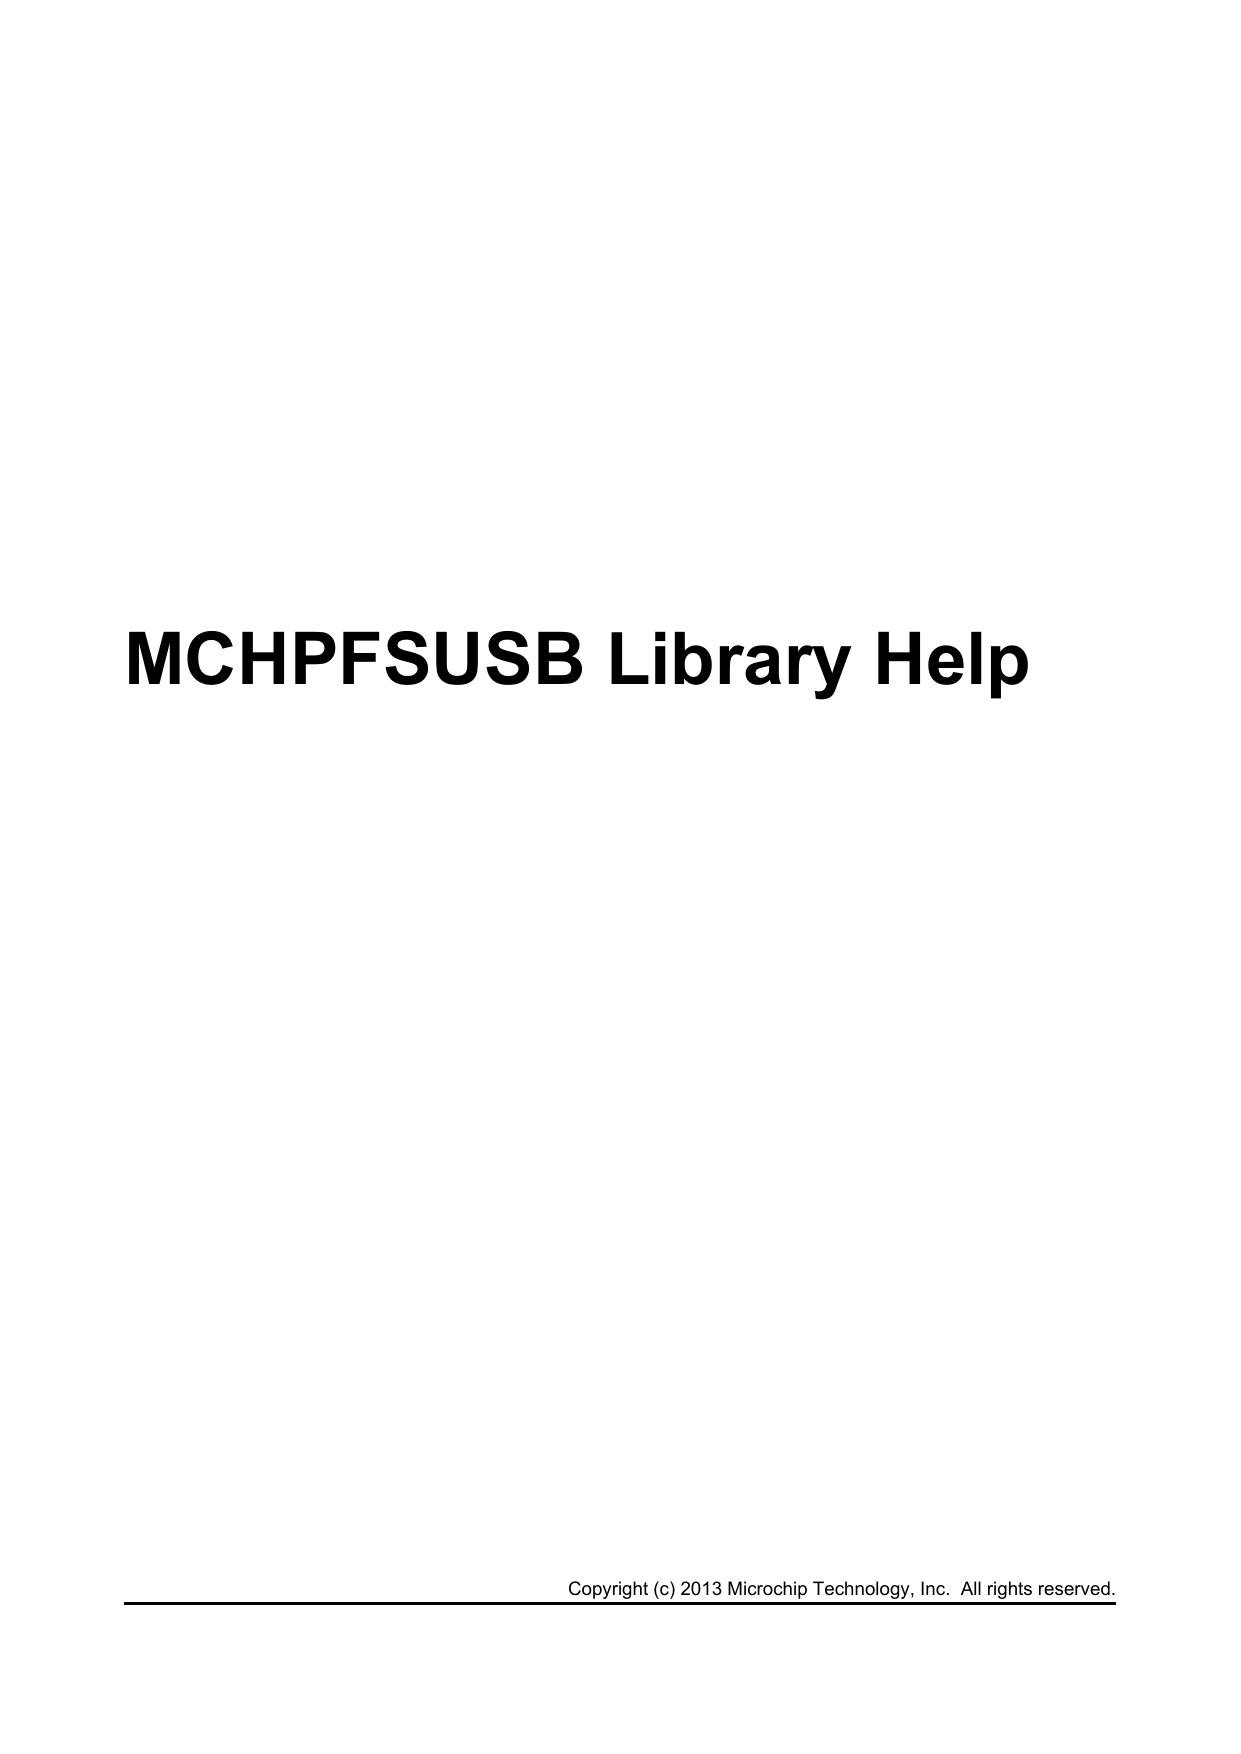 MCHPFSUSB Library Help | manualzz com